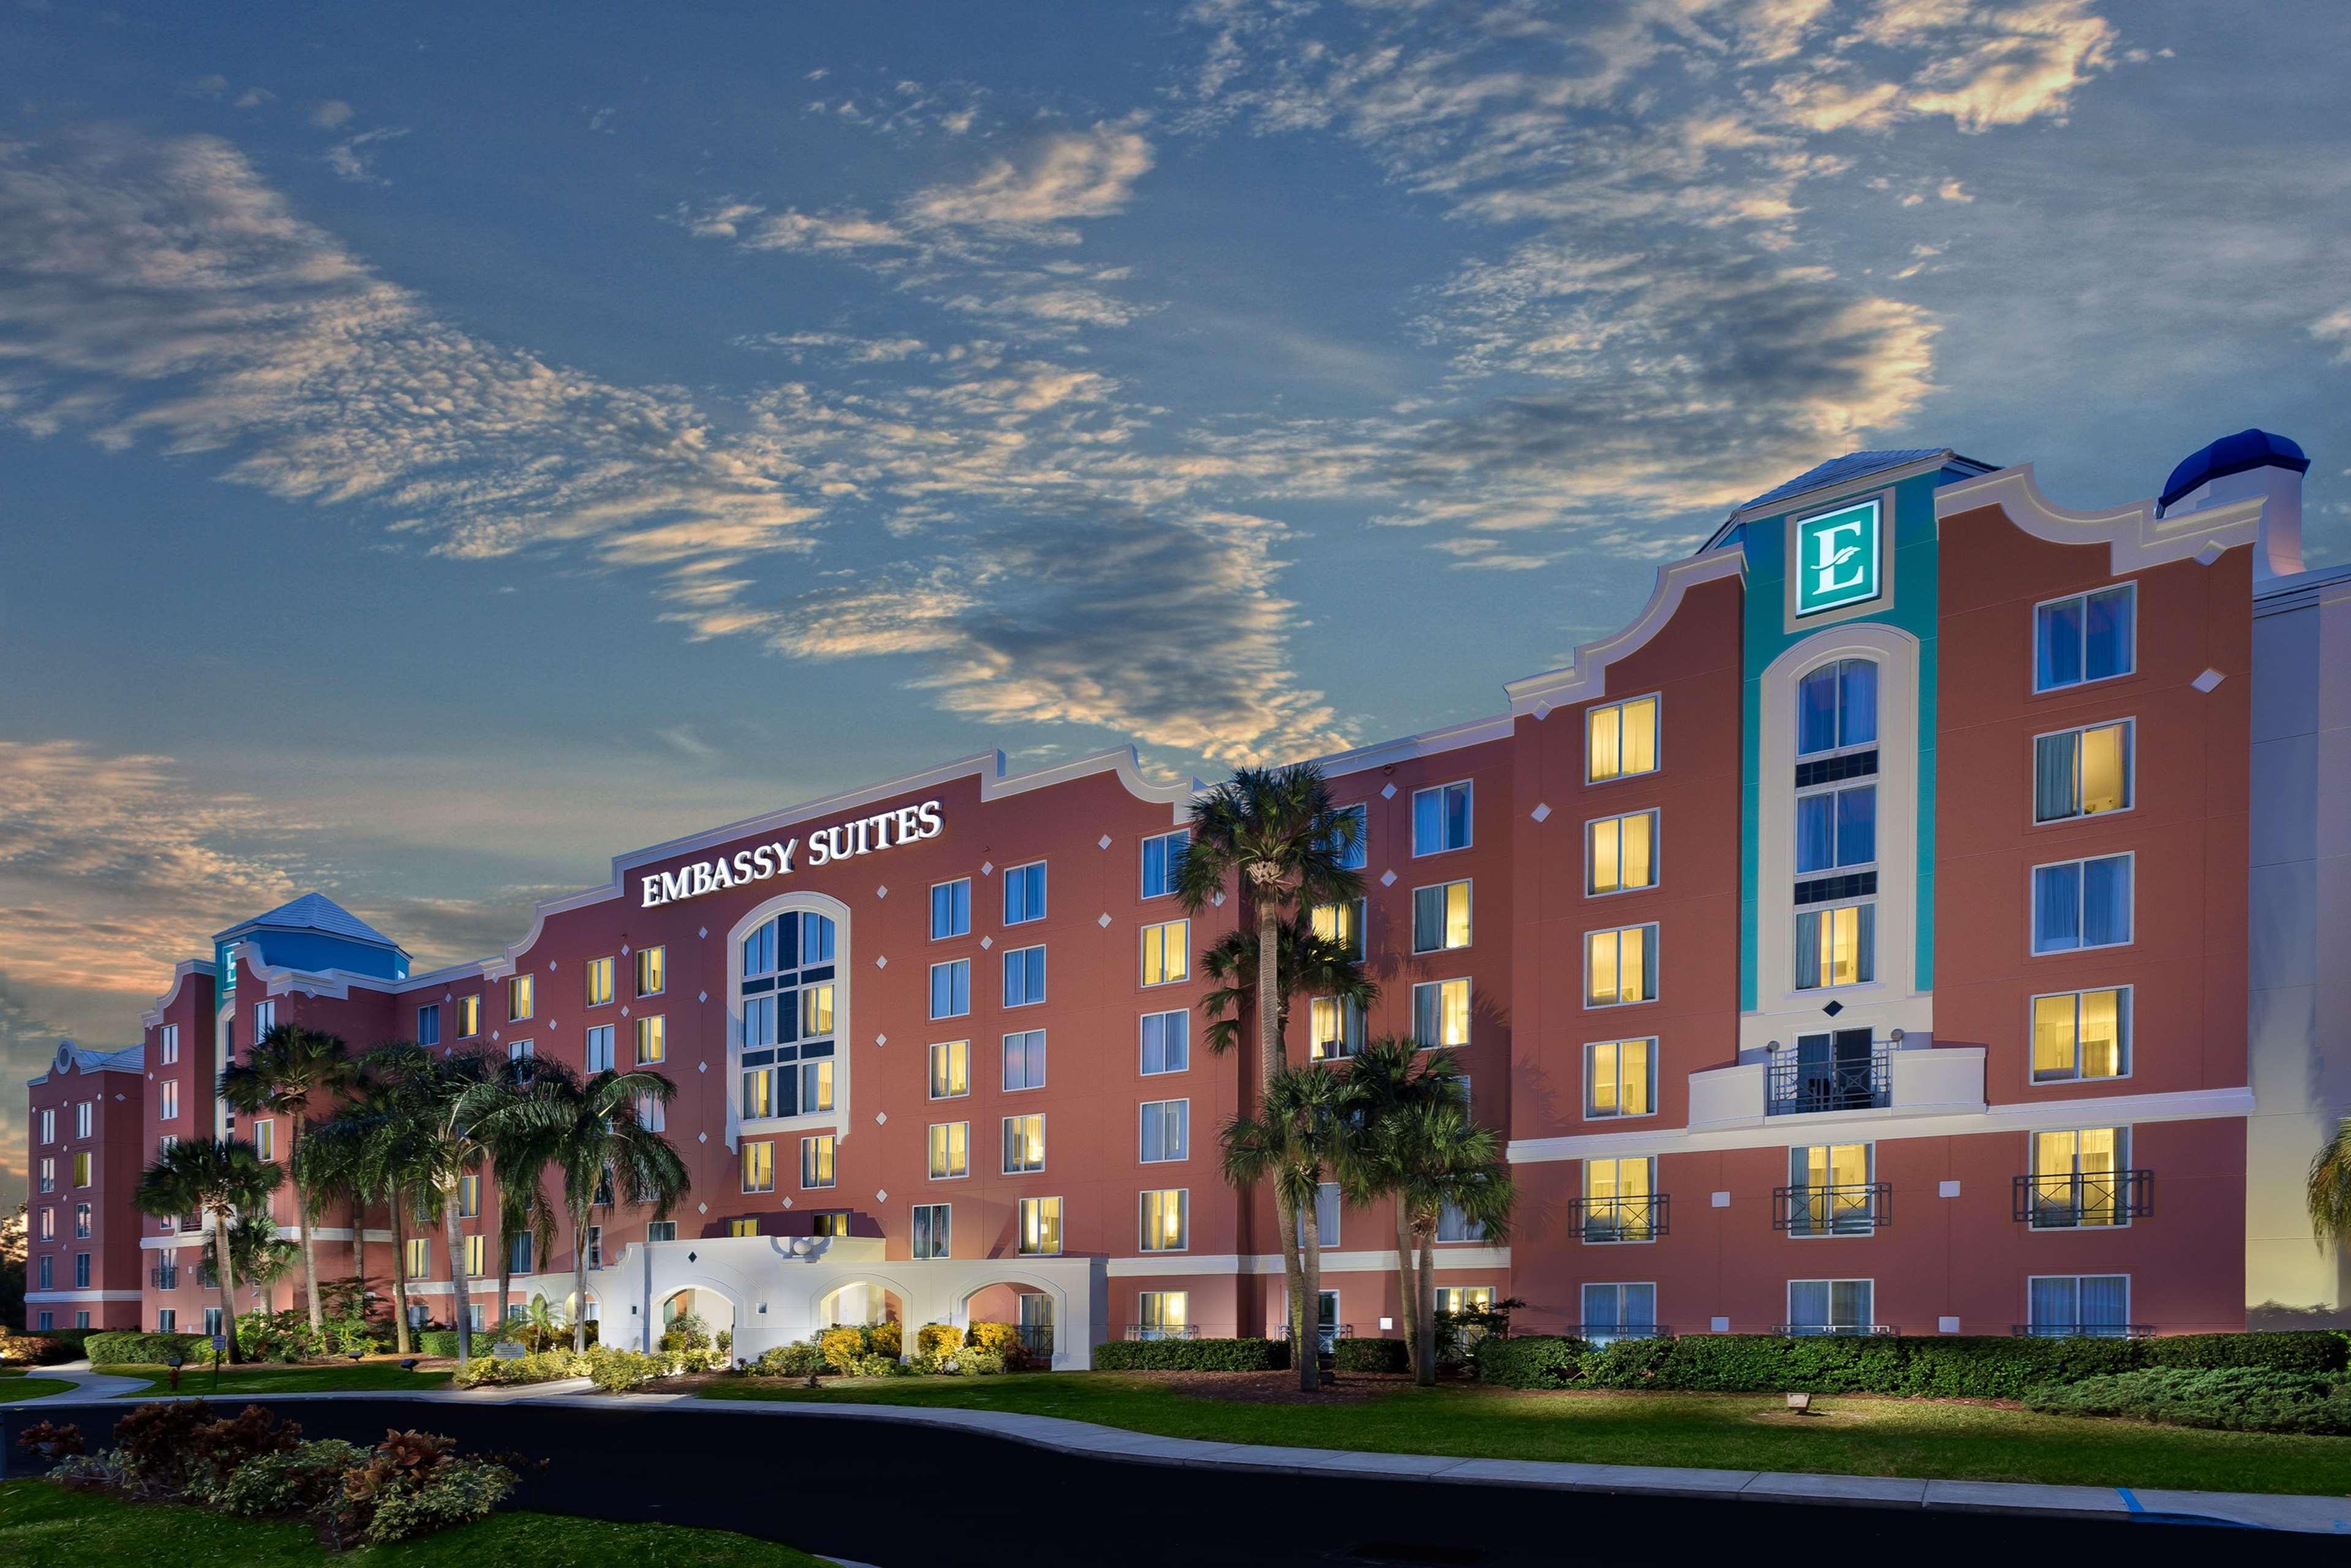 Embassy Suites by Hilton Orlando Lake Buena Vista Resort image 0